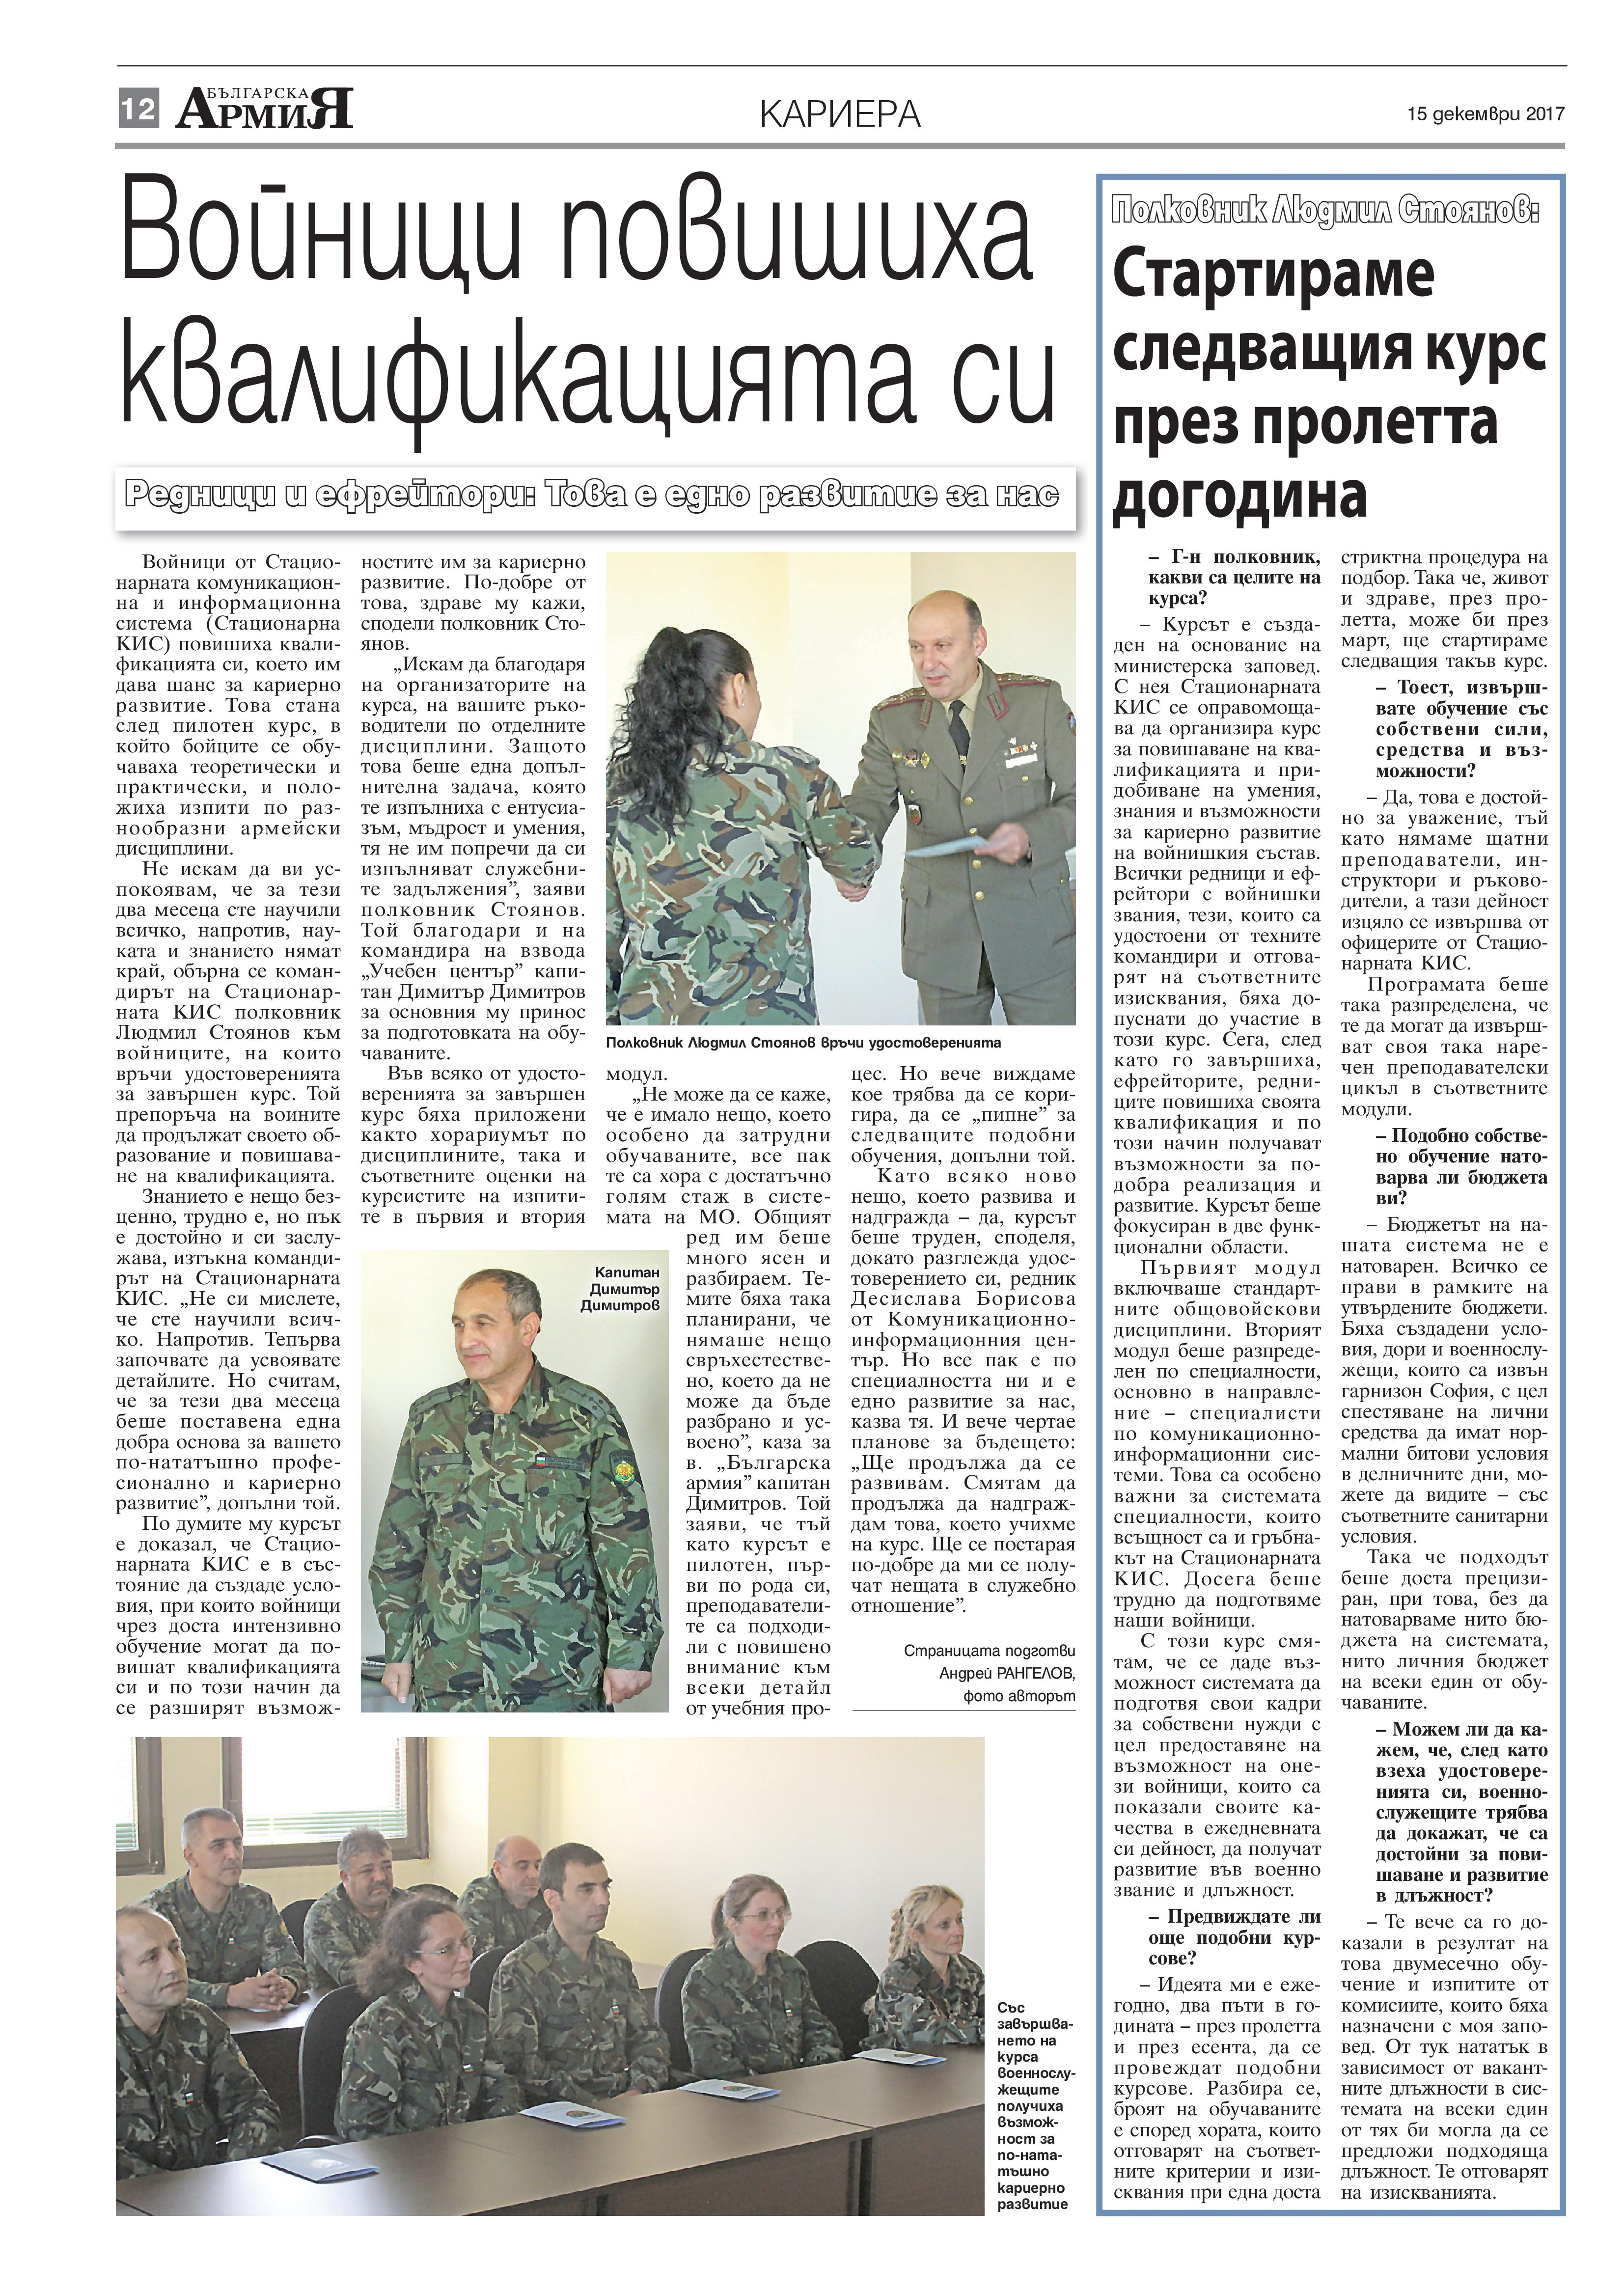 http://armymedia.bg/wp-content/uploads/2015/06/12-15.jpg